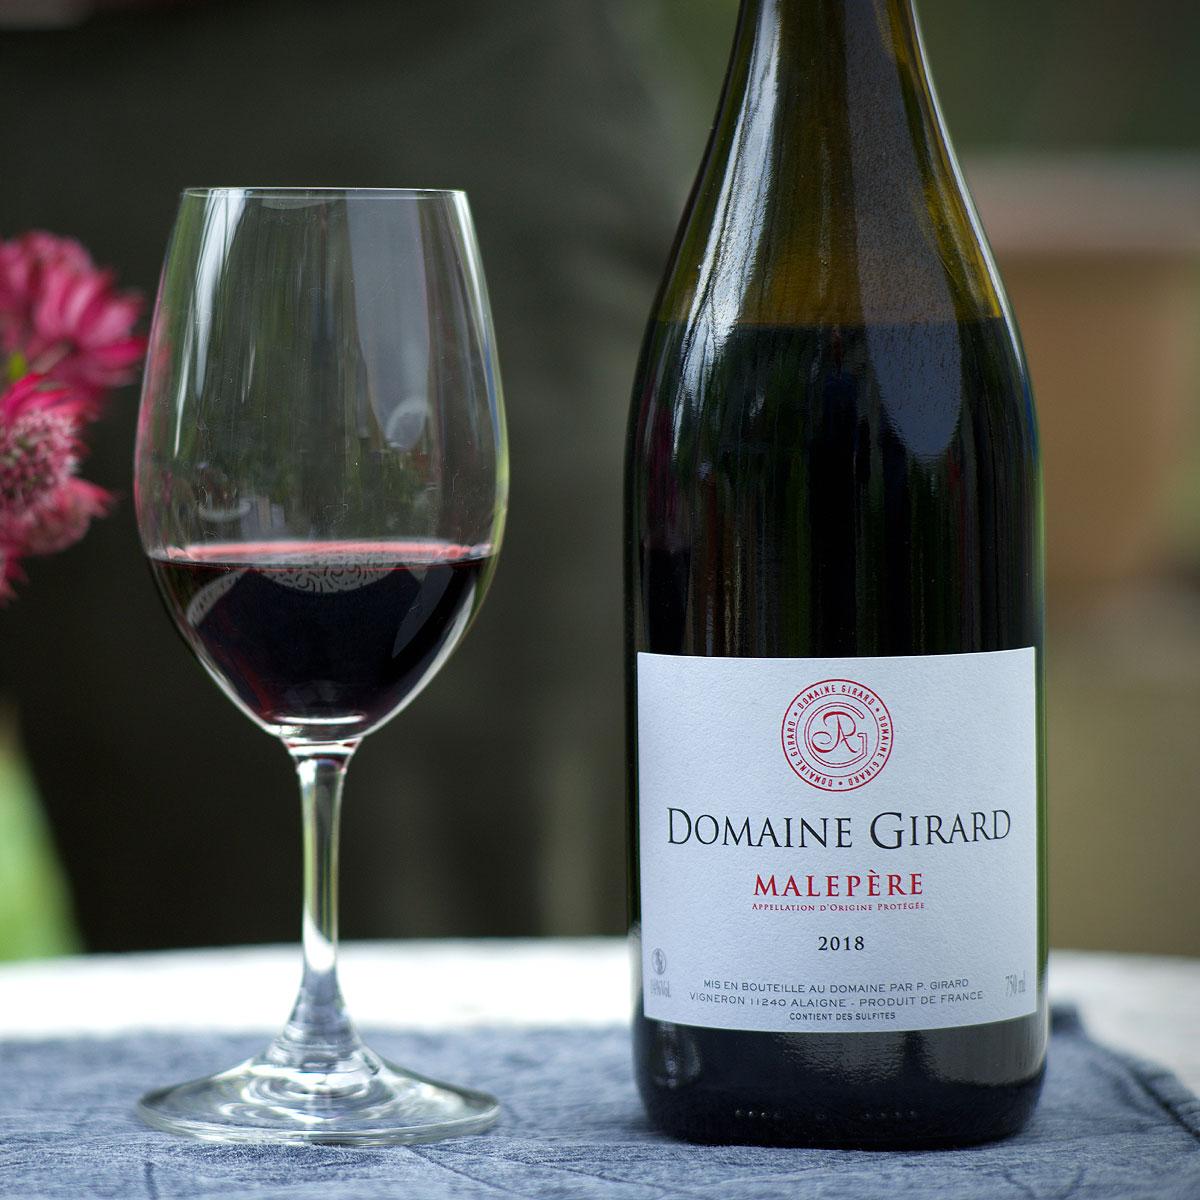 Malepère: Domaine Girard 'Cuvée Tradition' 2018 - Lifestyle